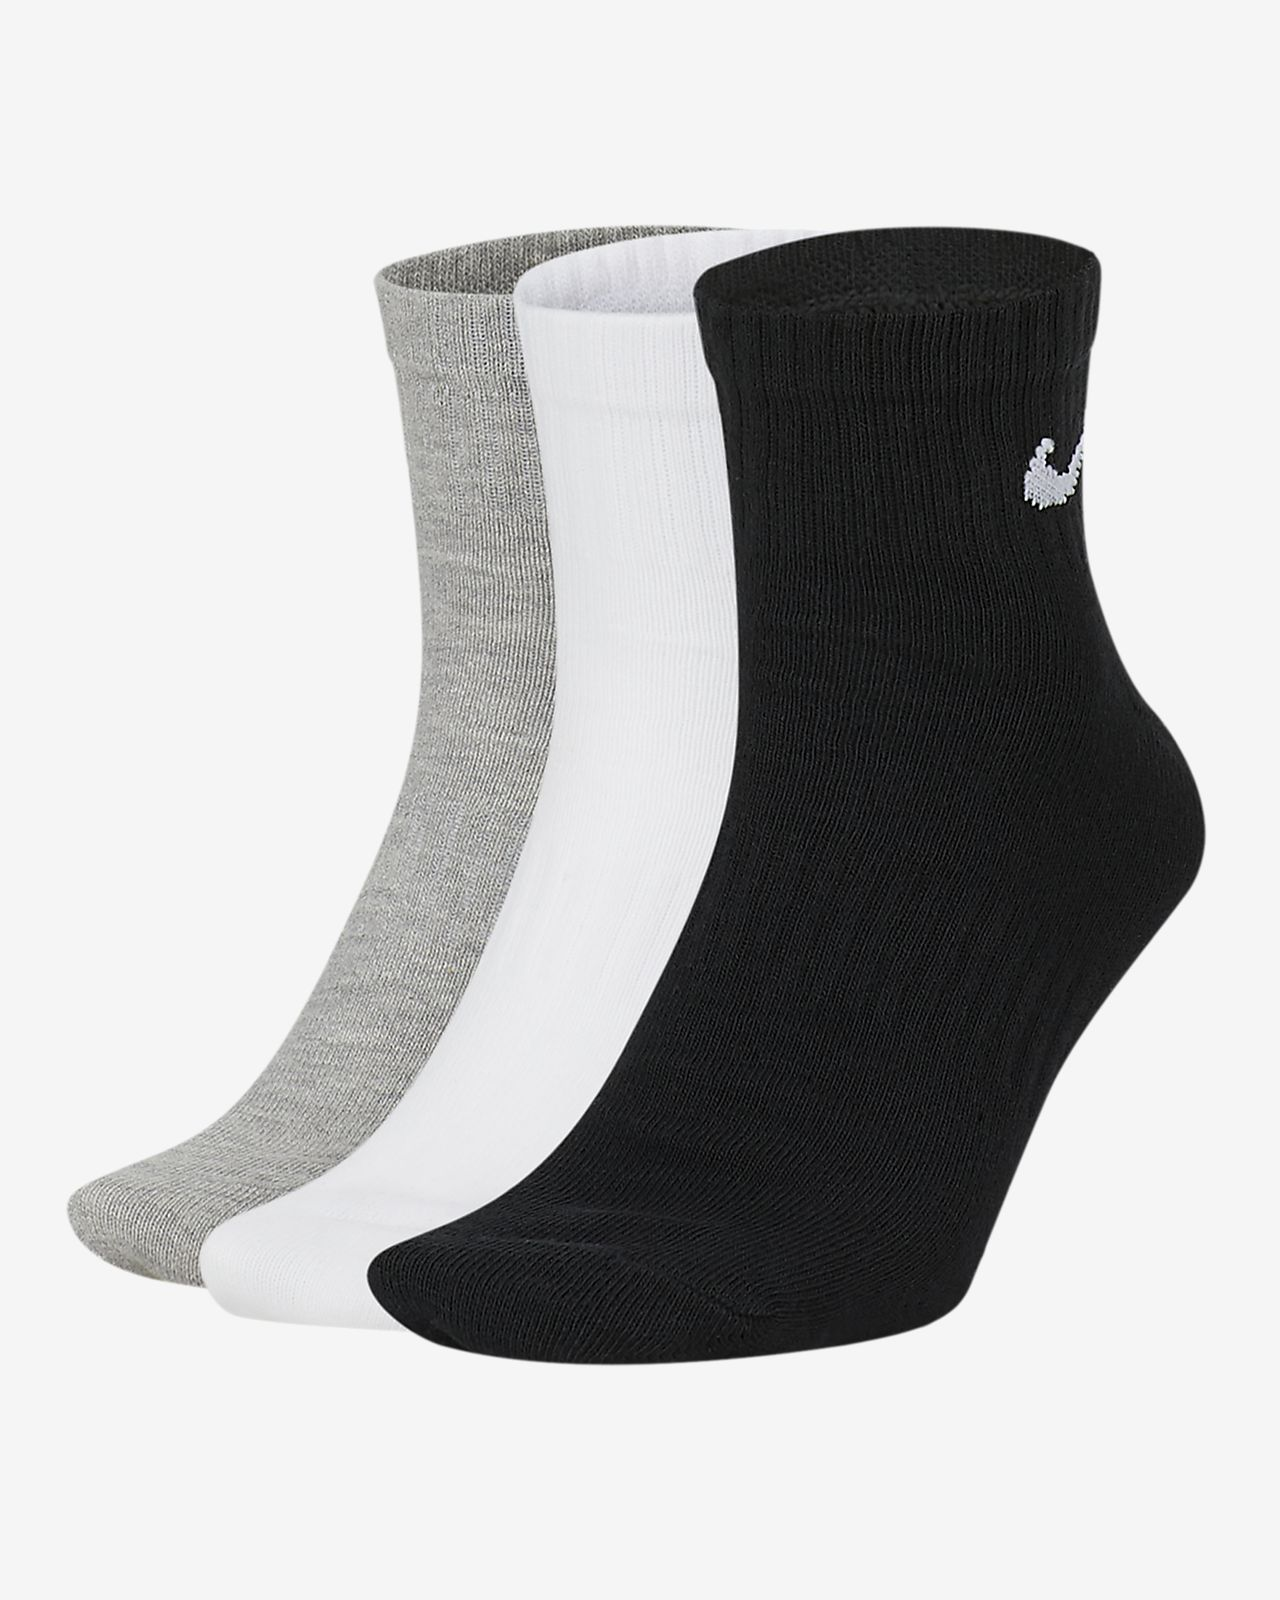 Nike Everyday Lightweight Ankle Training Socks (3 Pair)